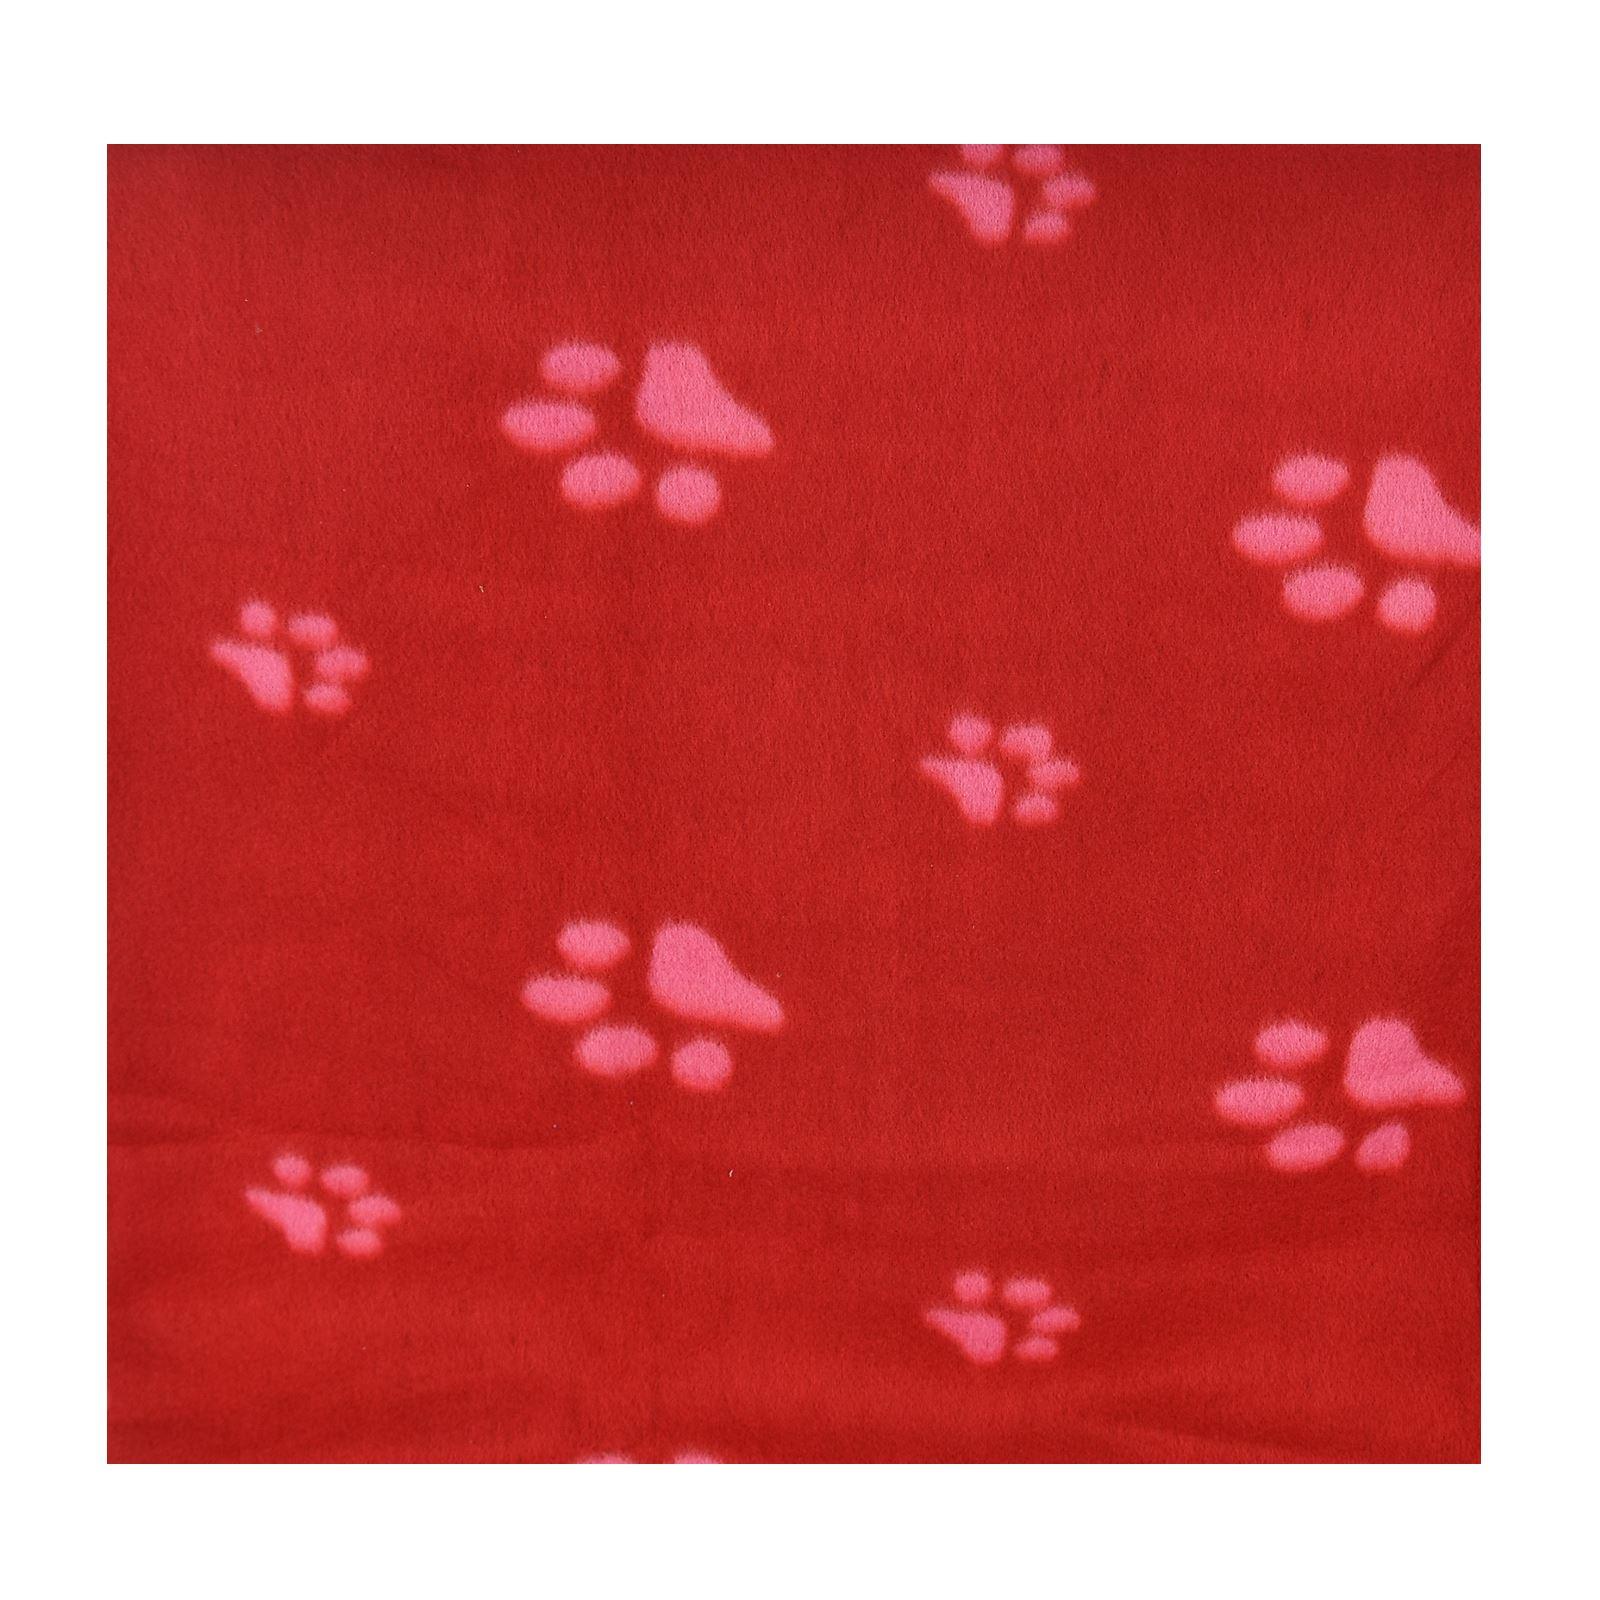 Warm-Pet-Mat-Paw-Print-Cat-Dog-Puppy-Fleece-Soft-Blanket-Bed-Cushion-One-Size thumbnail 18